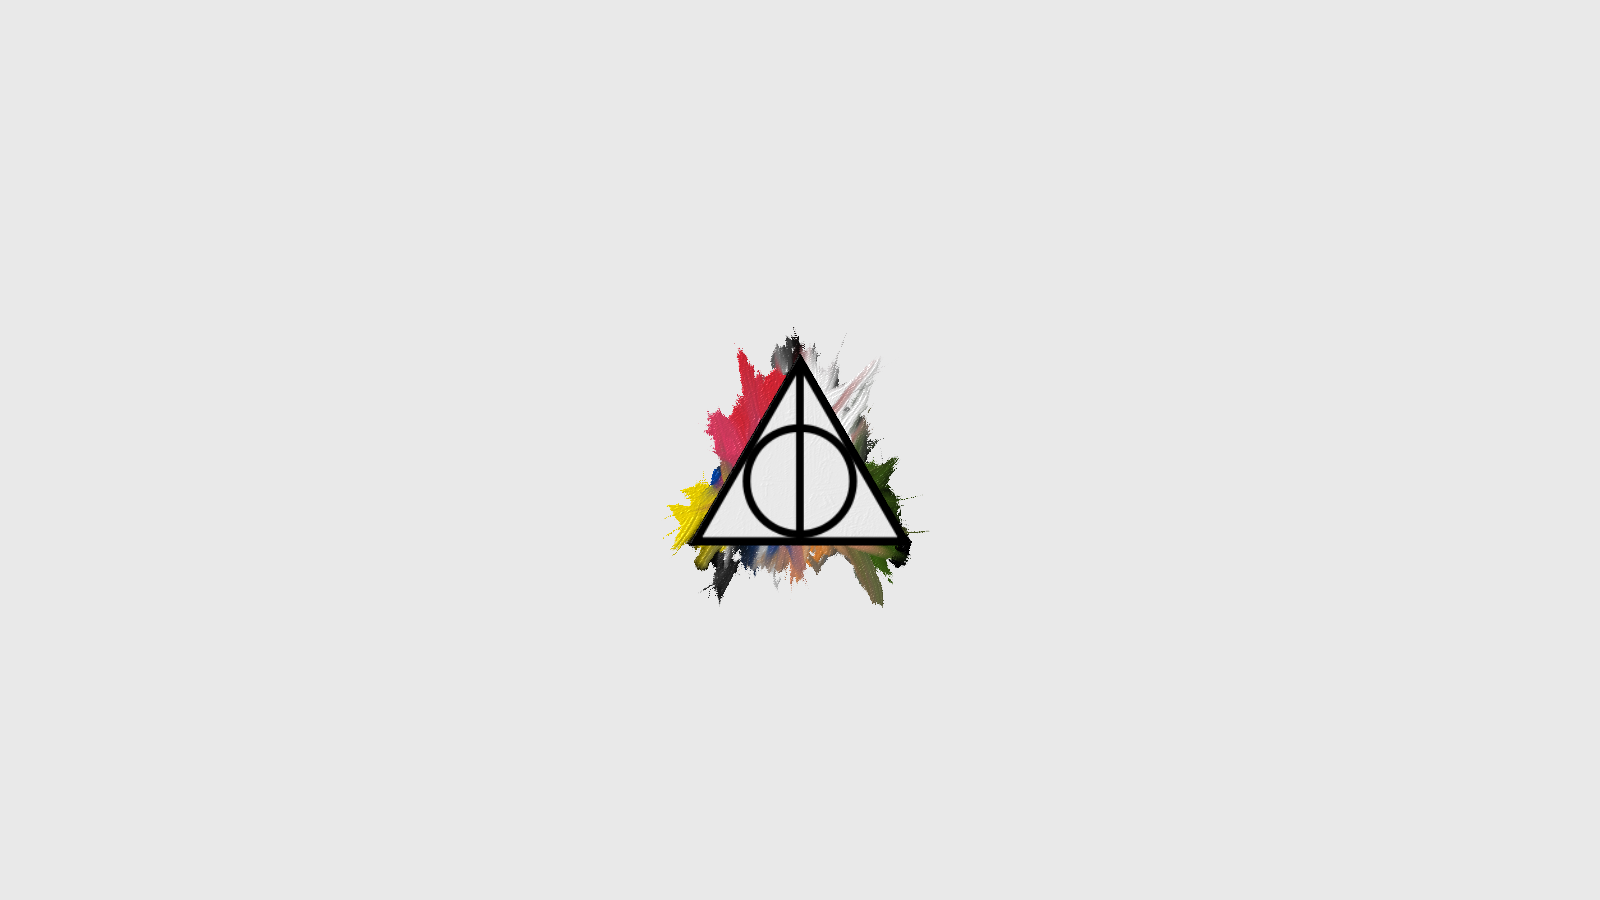 Most Inspiring Wallpaper Harry Potter Fanart - harry_potter_s_life_white_by_cirogiso-d6rrvoi  Trends_429177.png